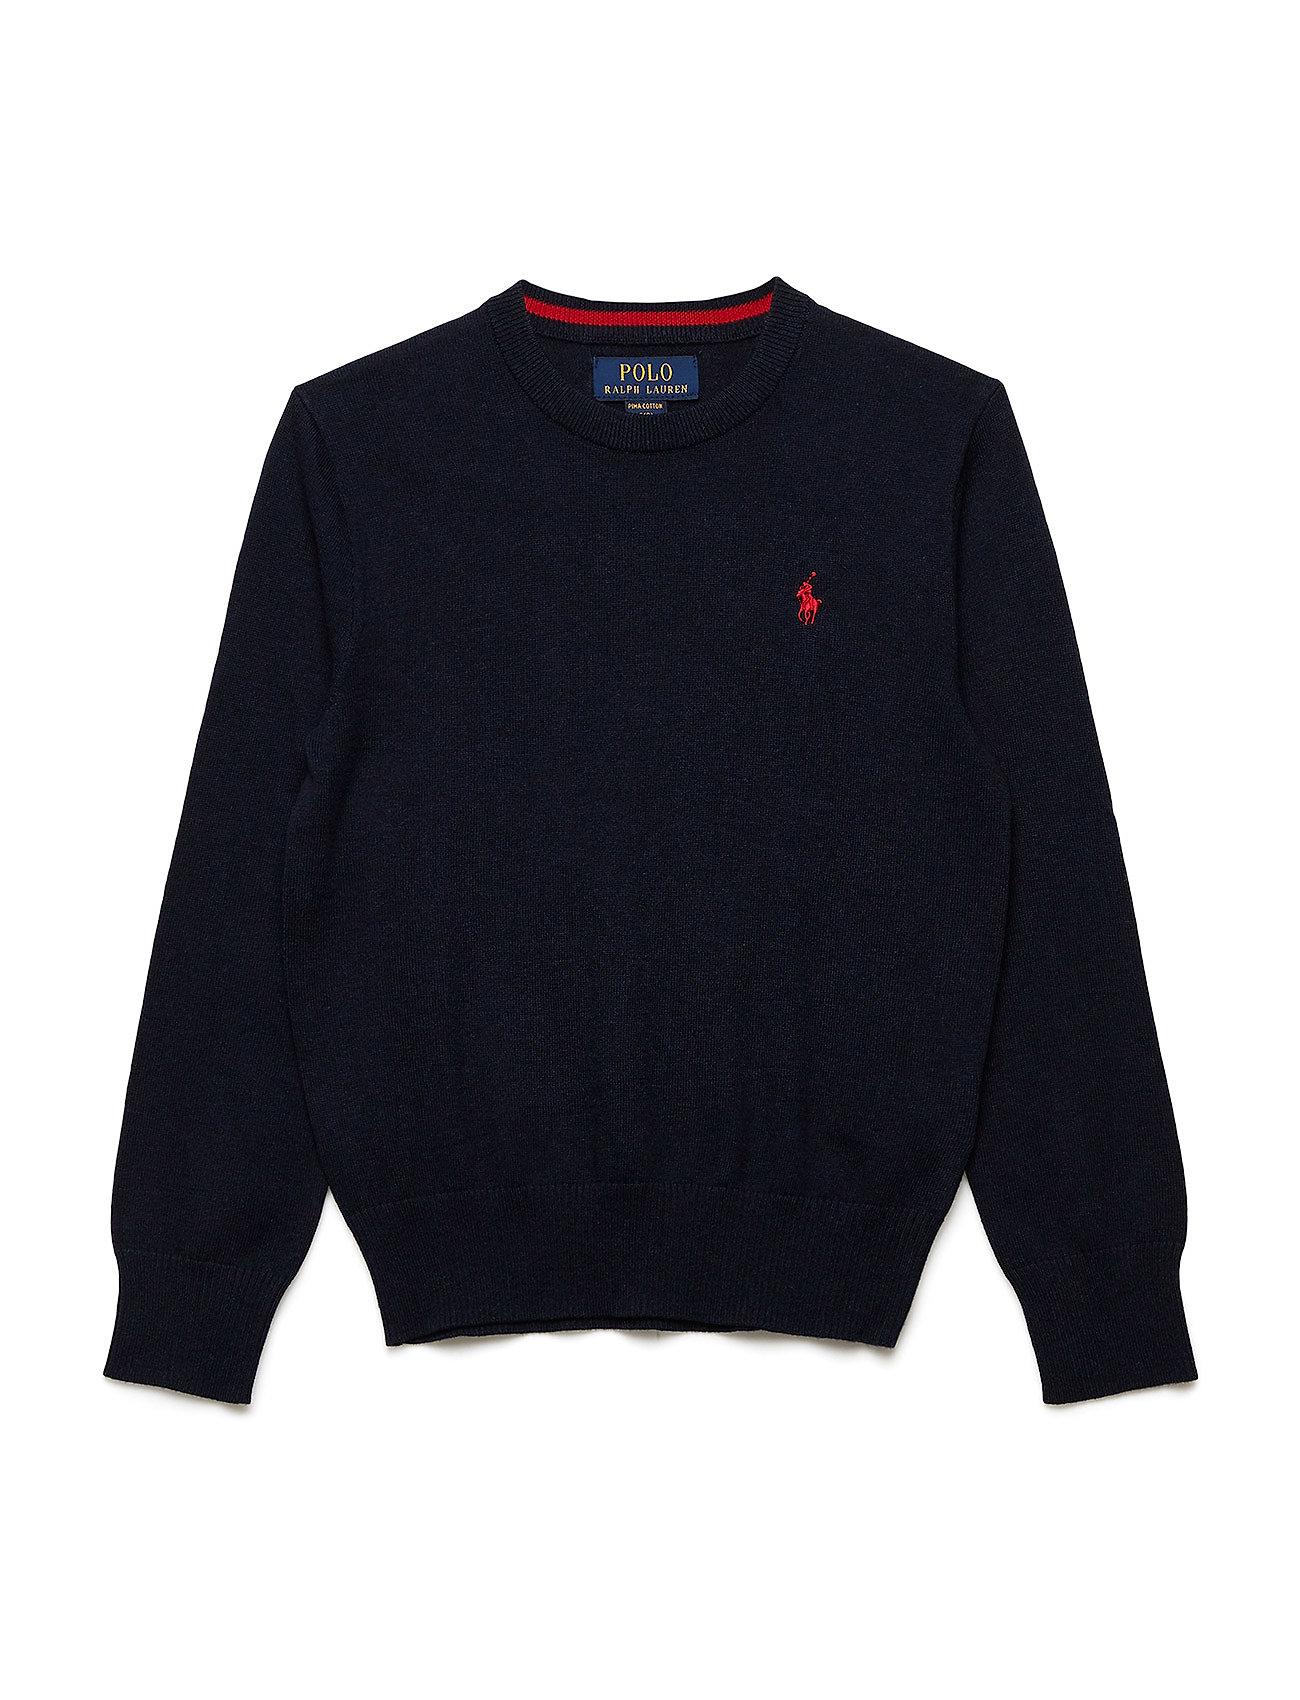 Ralph Lauren Kids Cotton Crewneck Sweater